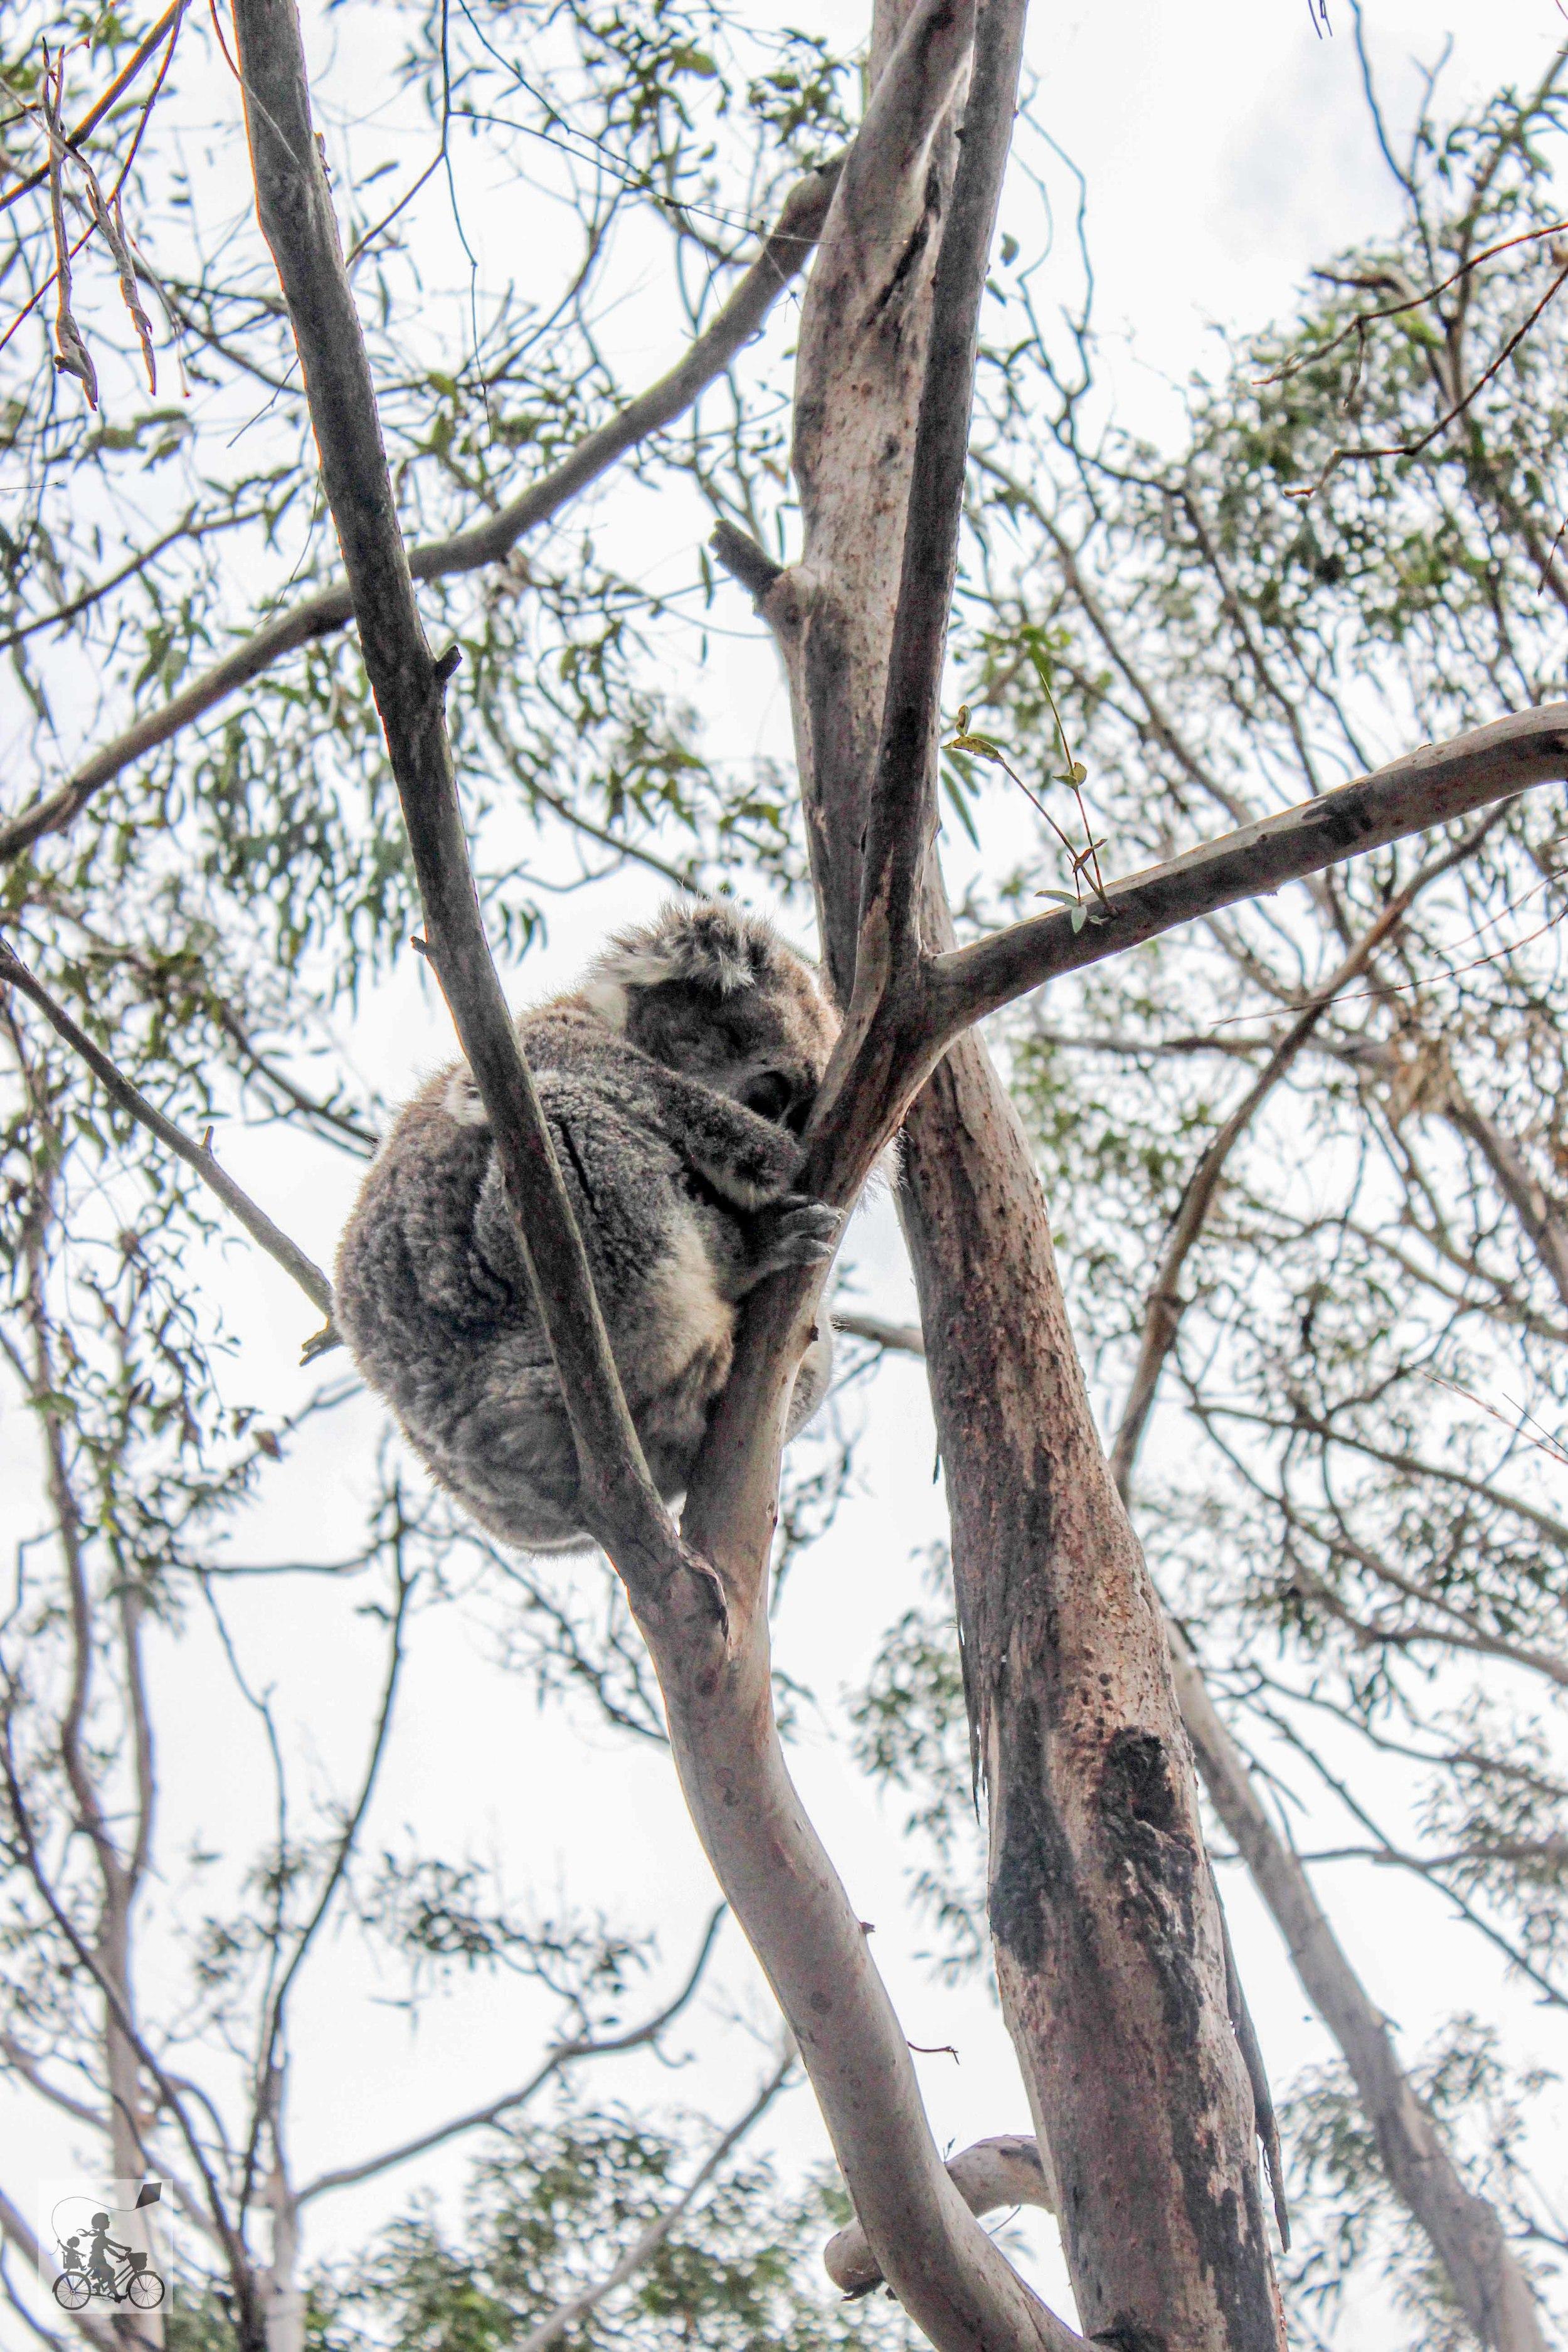 Mamma Knows East - Koala Conservation Centre